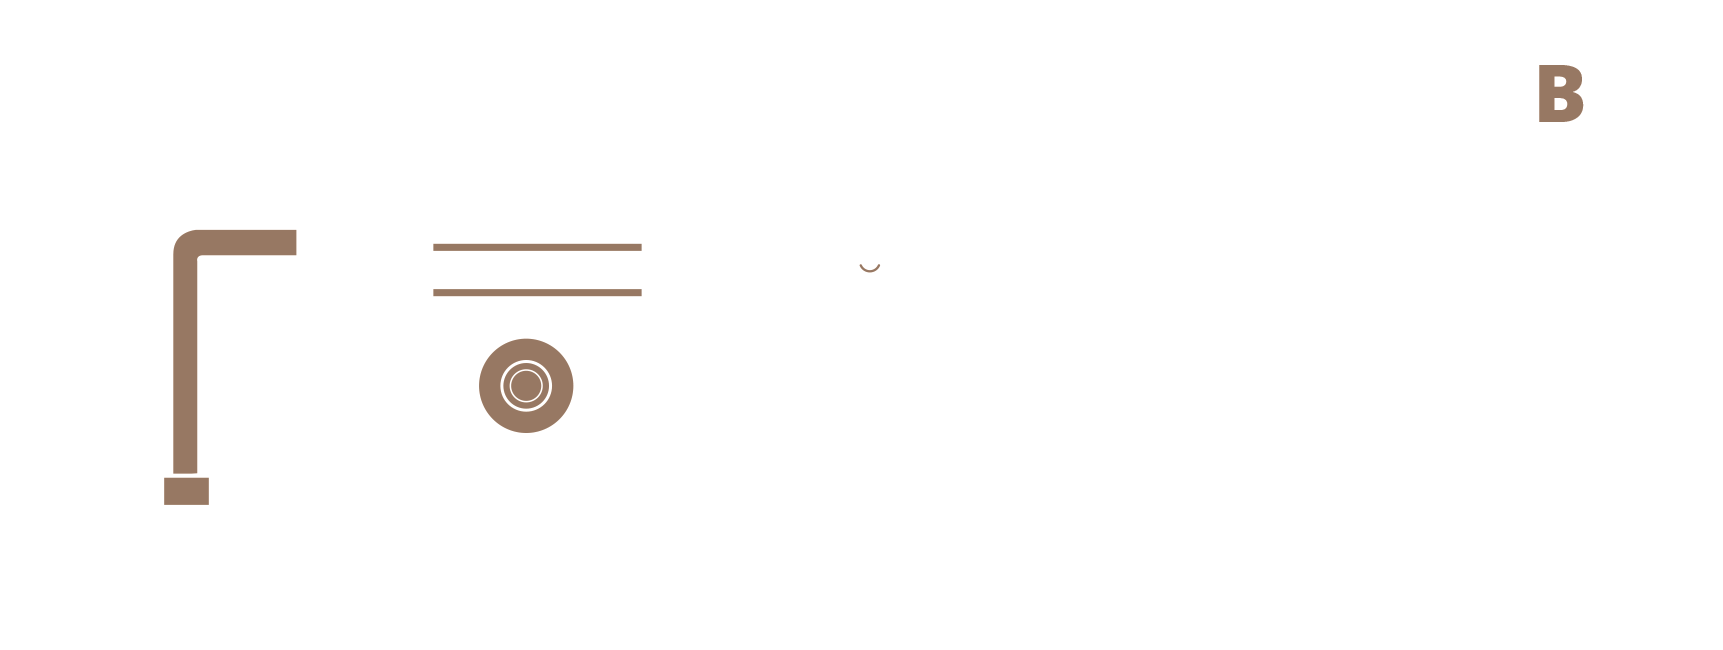 01.11 pompe irrigazione veneta